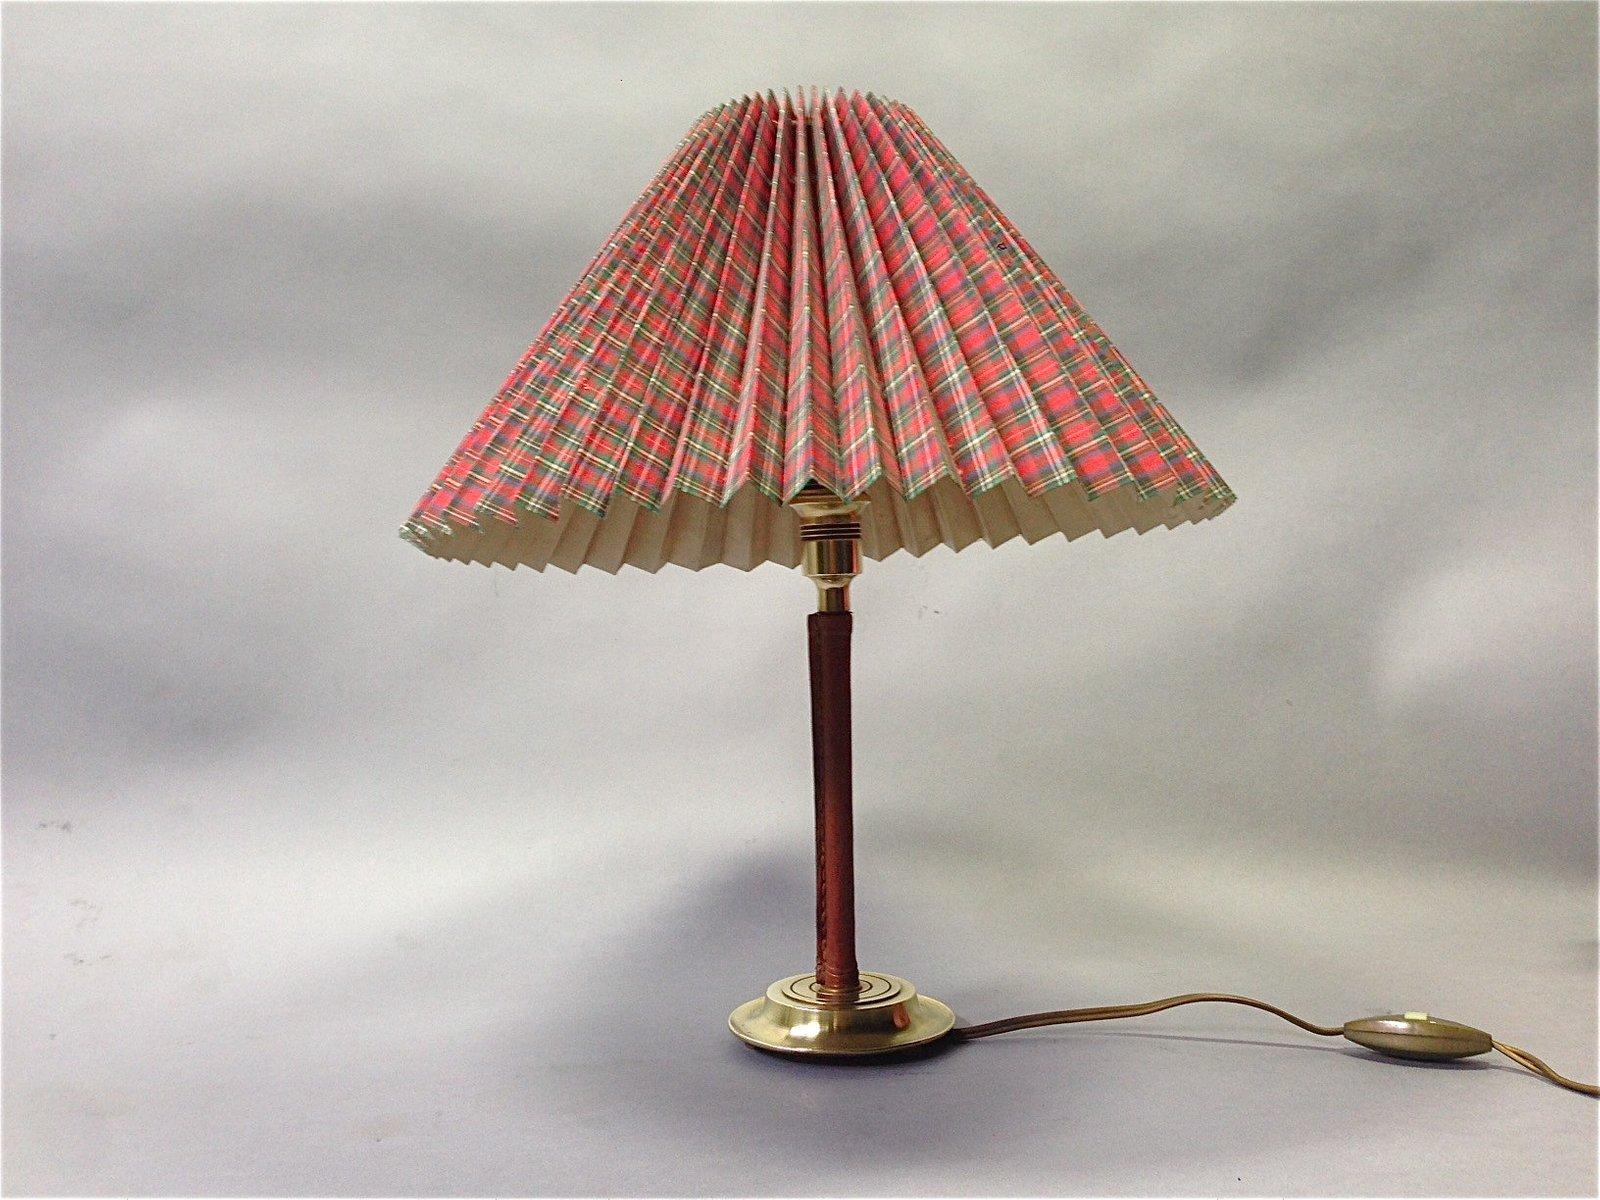 lampe von jacques adnet 1950er bei pamono kaufen. Black Bedroom Furniture Sets. Home Design Ideas